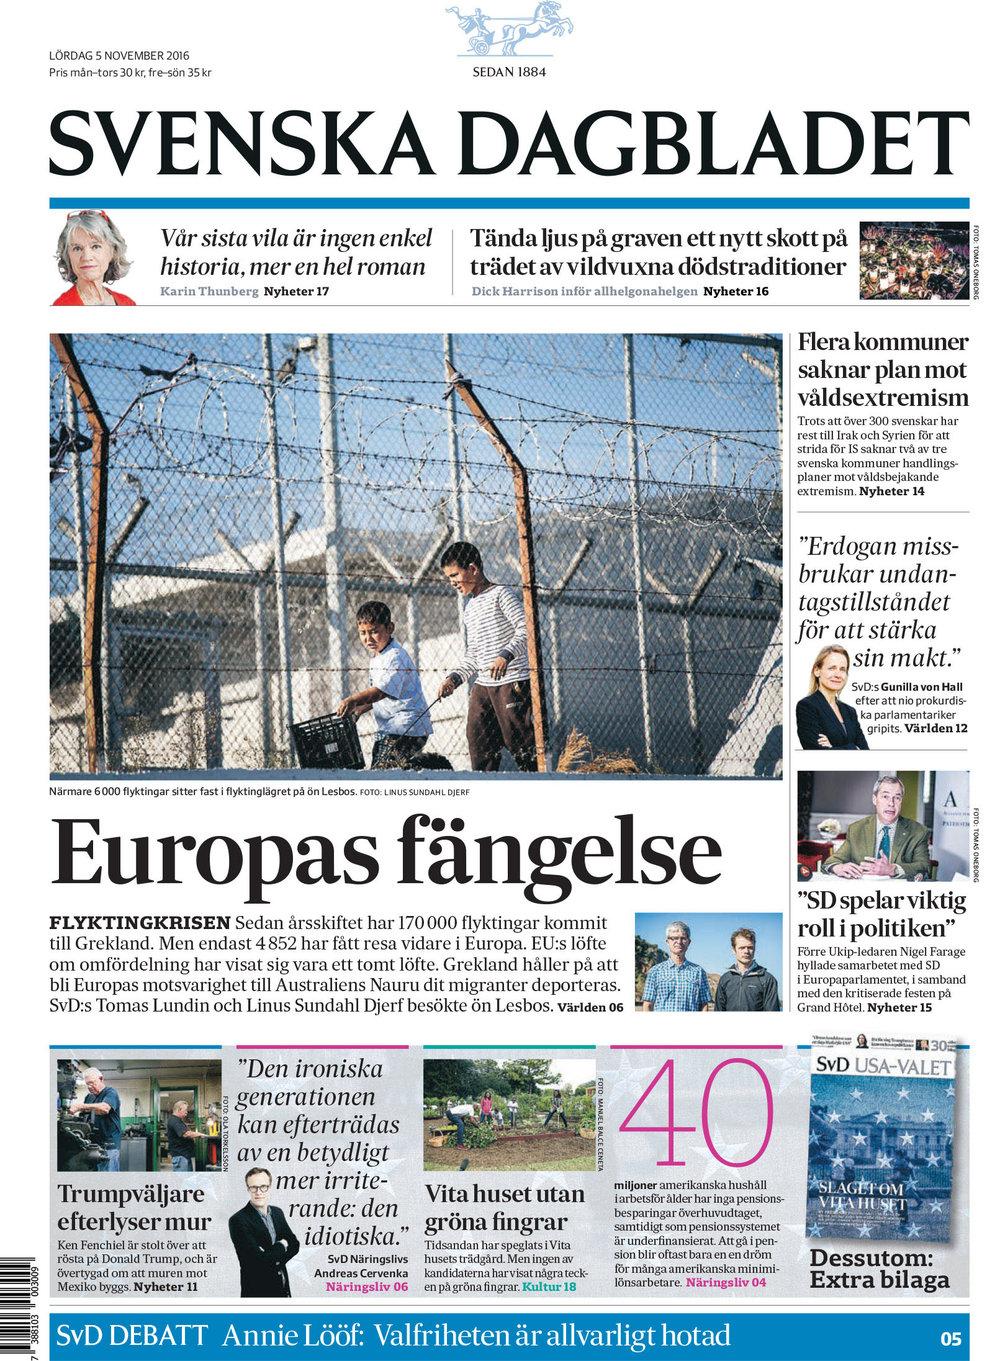 Svenska Dagbladet, Sweden